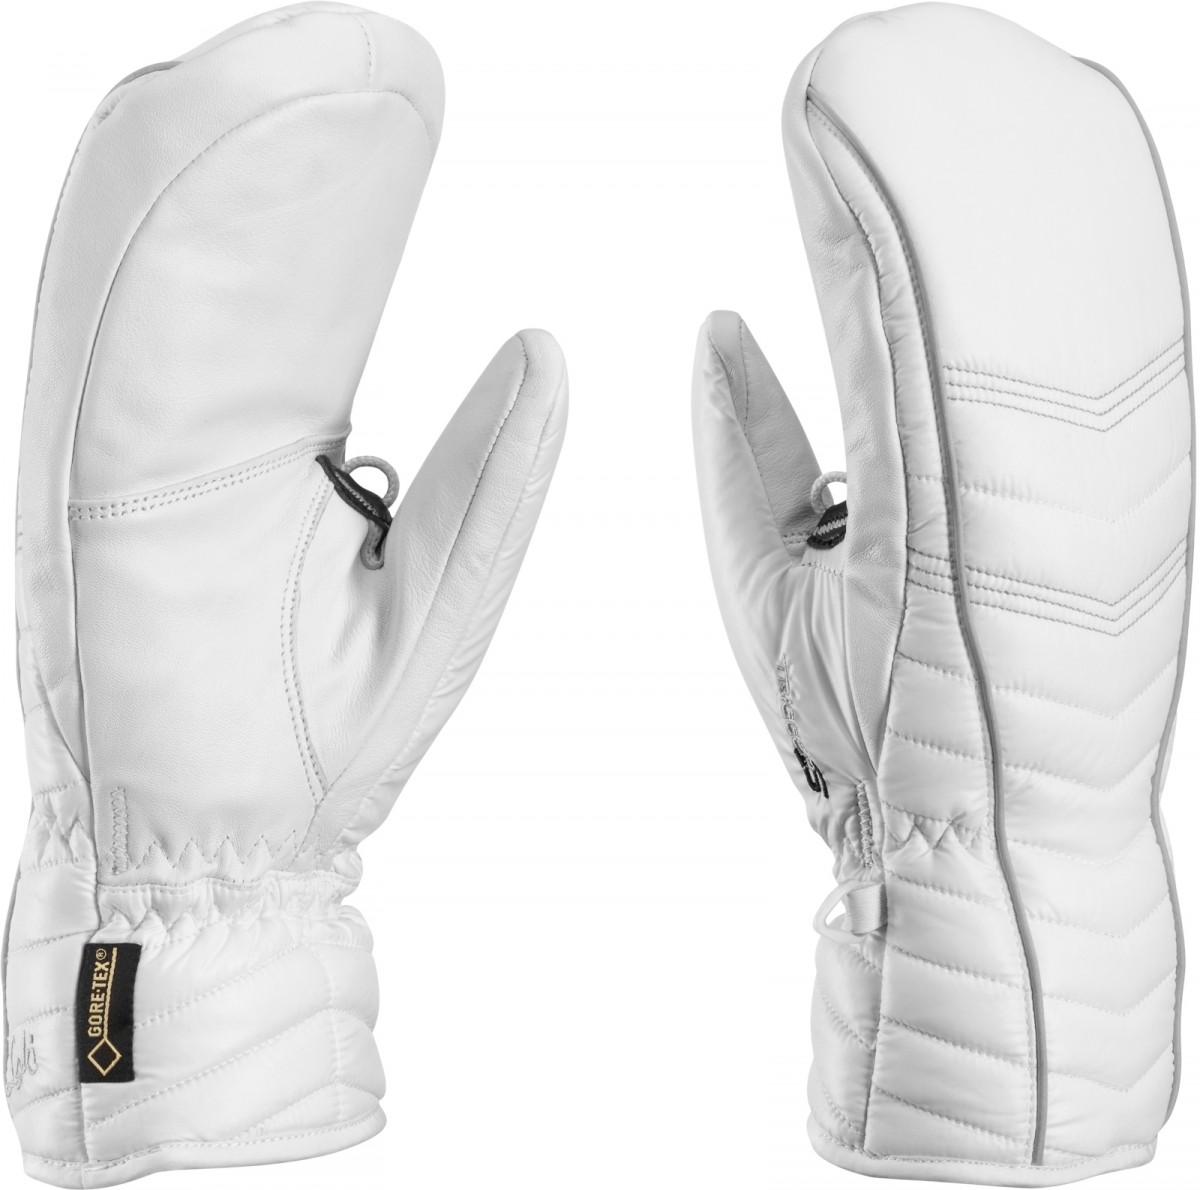 Leki ženske smučarske rokavice CORTINA S GTX LADY Mitten